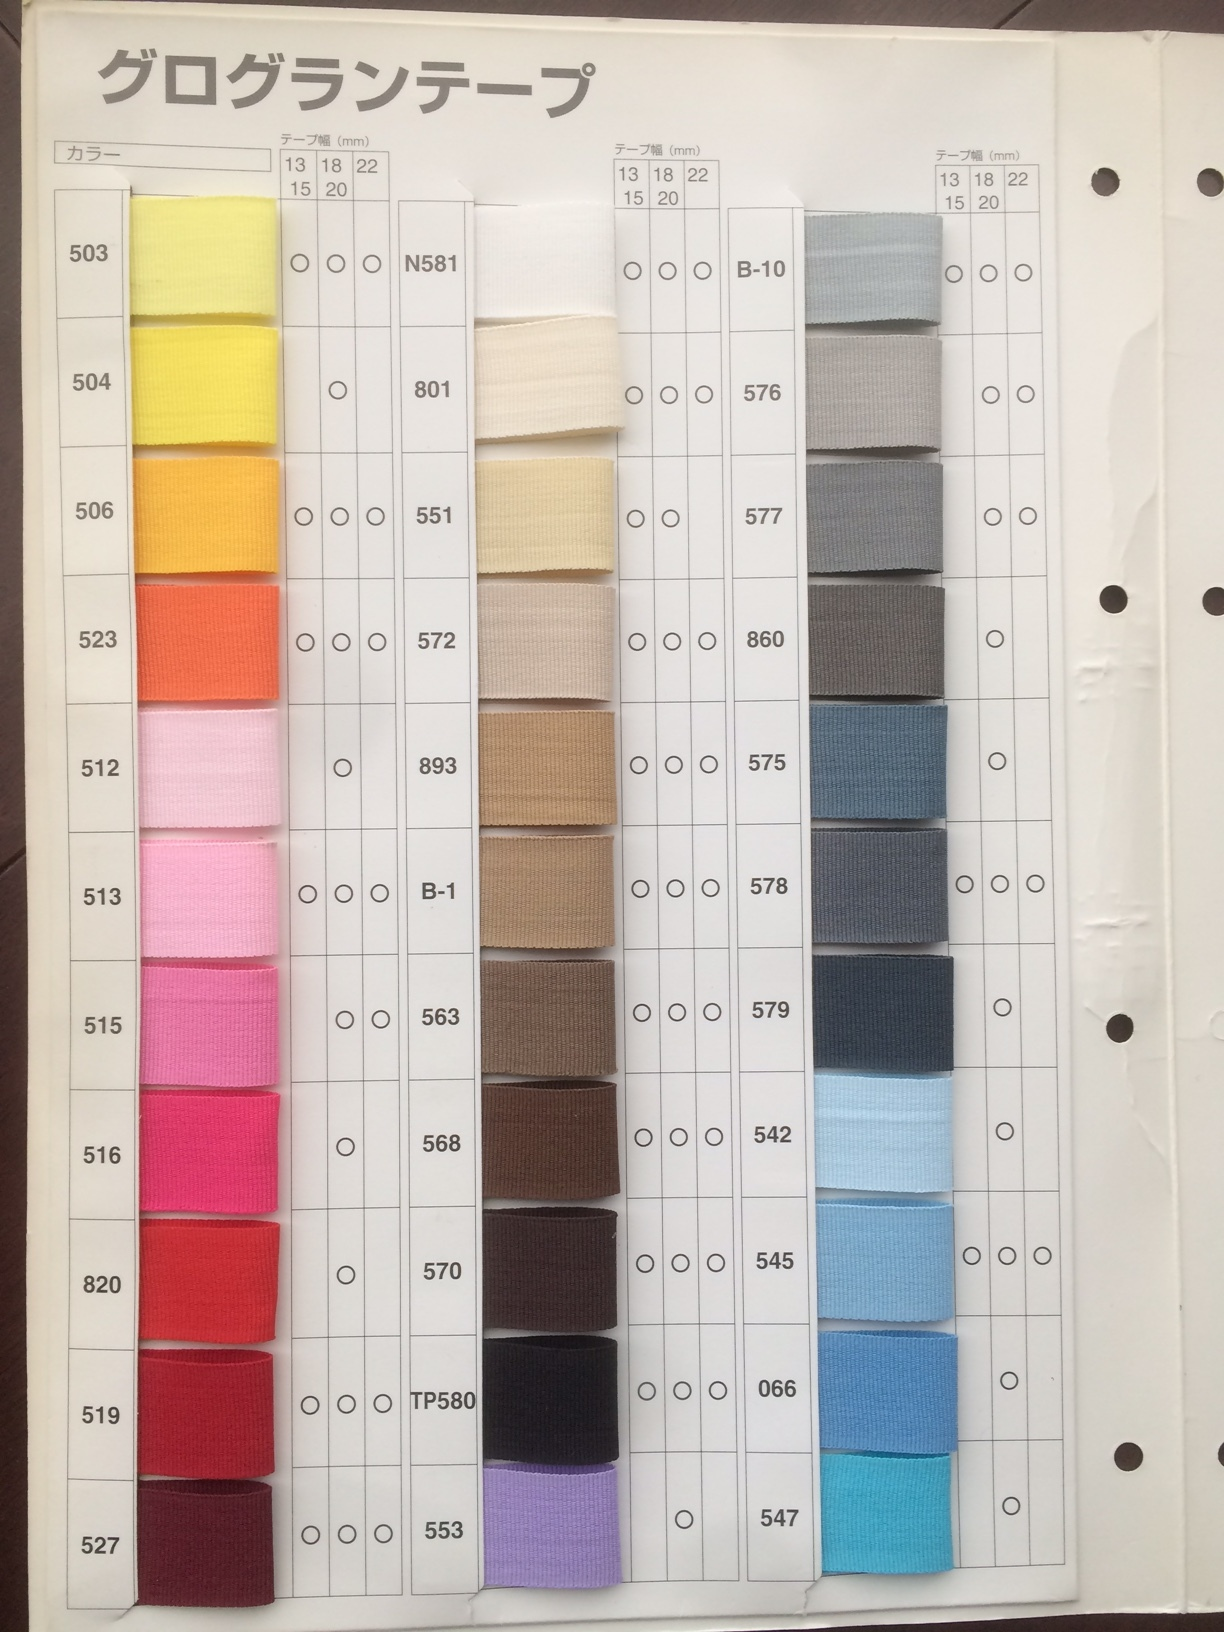 YKK グログランテープ 20㎜幅 カラー全色 10m巻